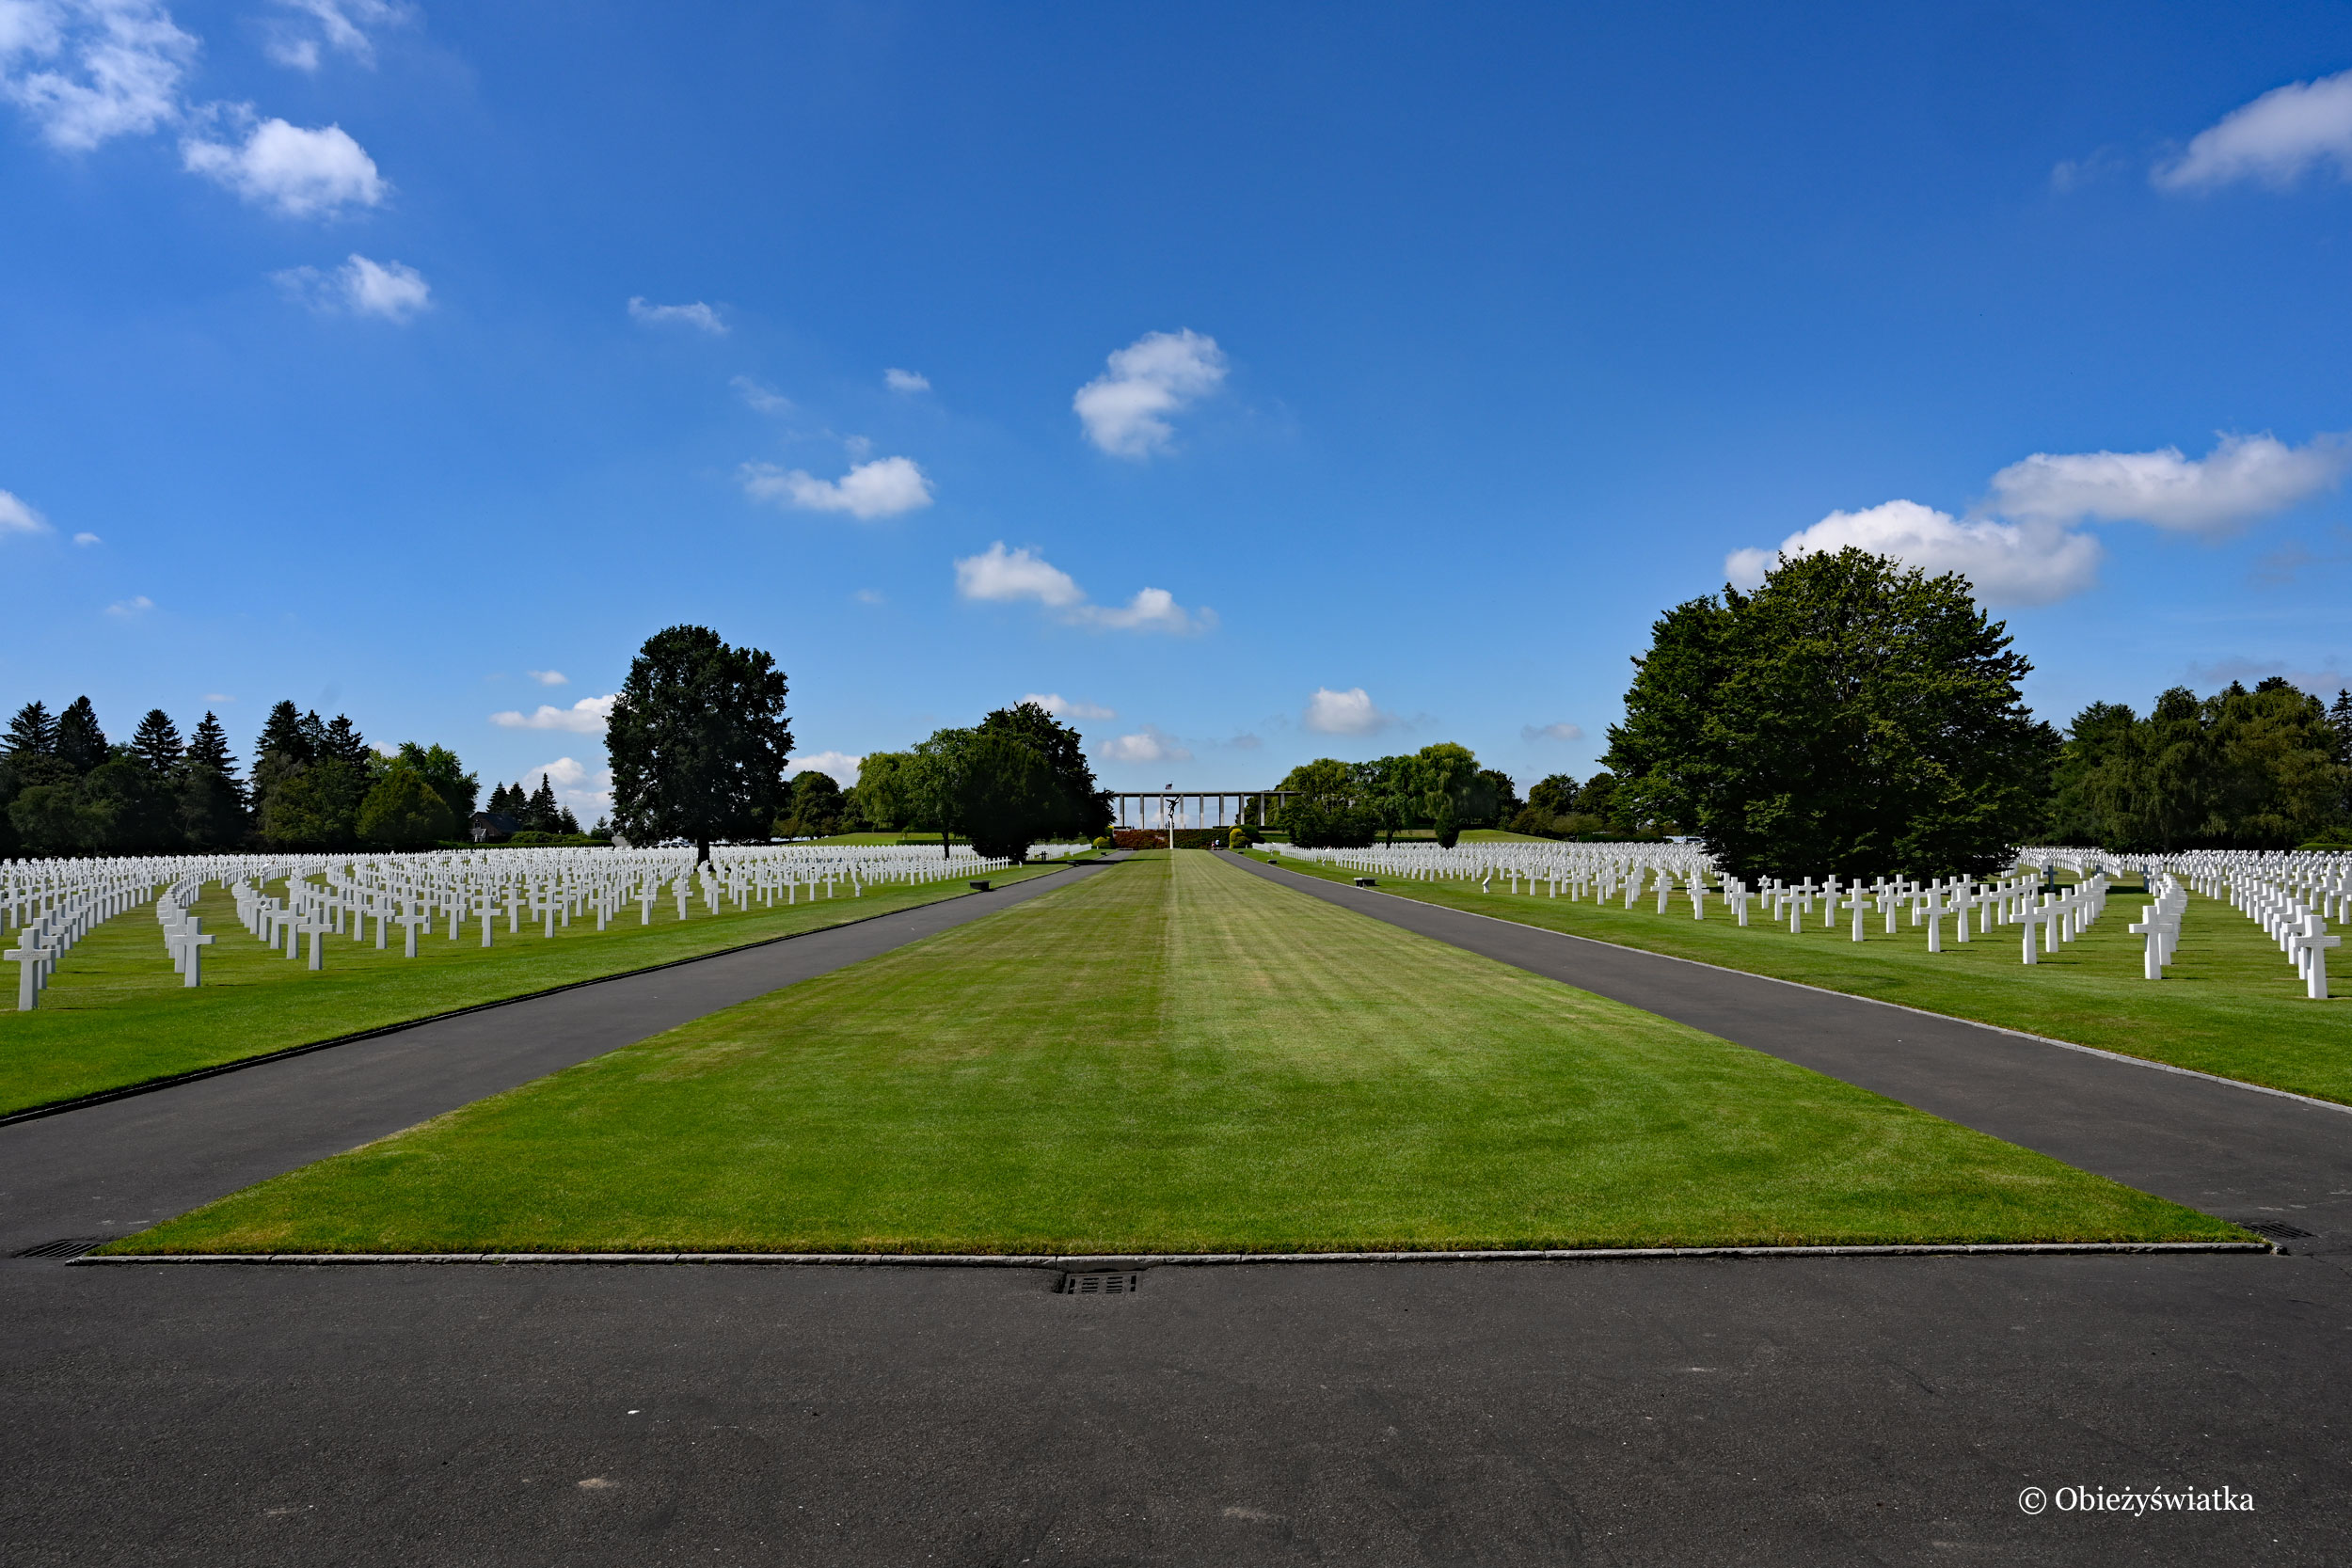 Amerykańska nekropolia w Henri Chapelle, Belgia